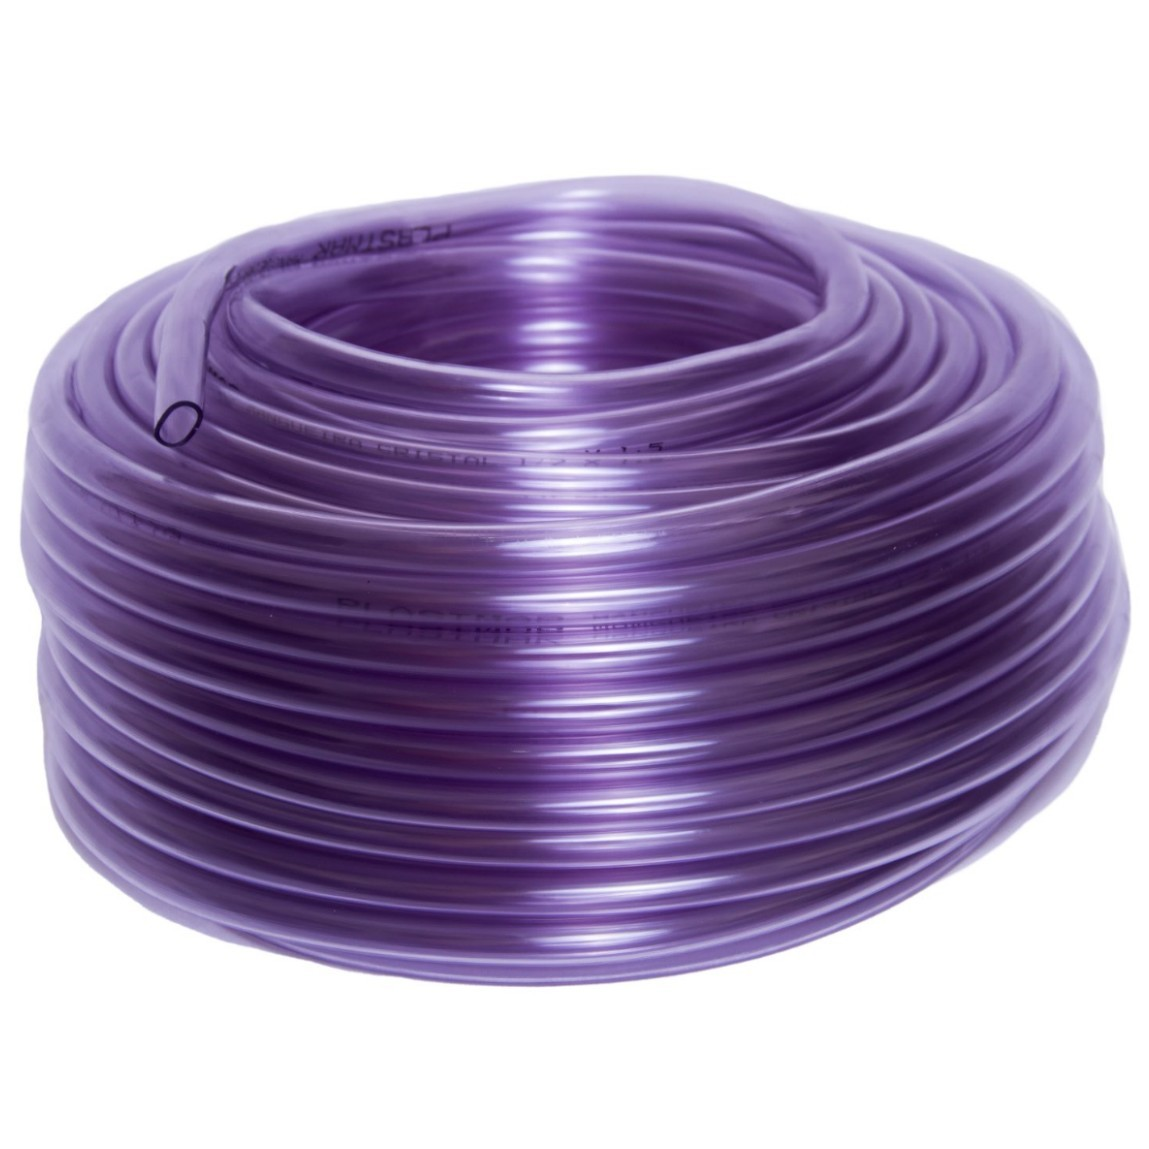 Mangueira de PVC 30m 34 Roxa 2451 - Plastmar